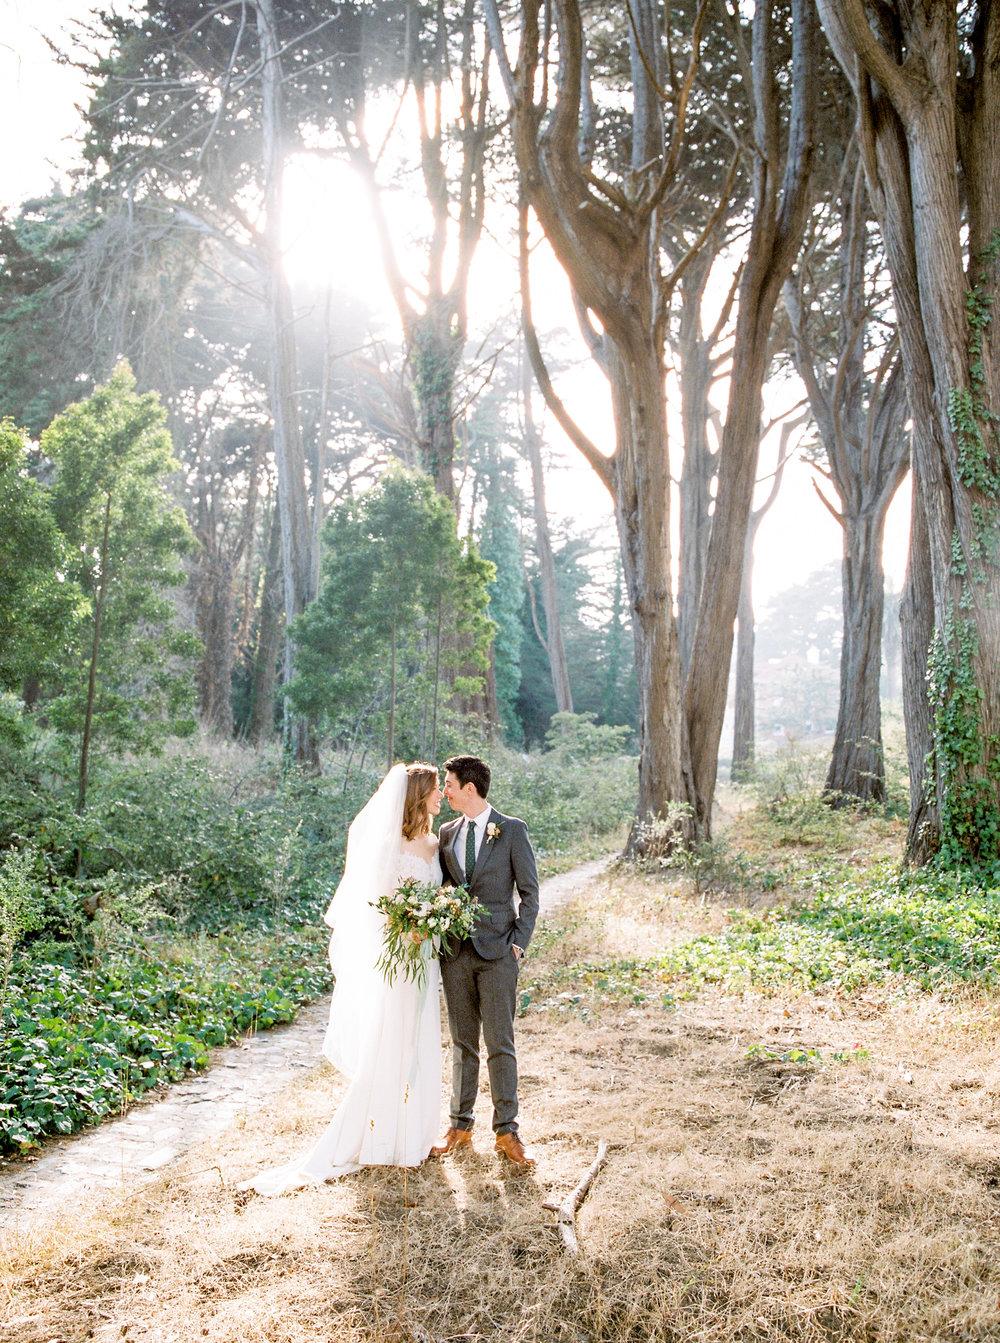 Log-cabin-wedding-in-presidio-san-francisco-california-desintation-wedding-photography-53.jpg